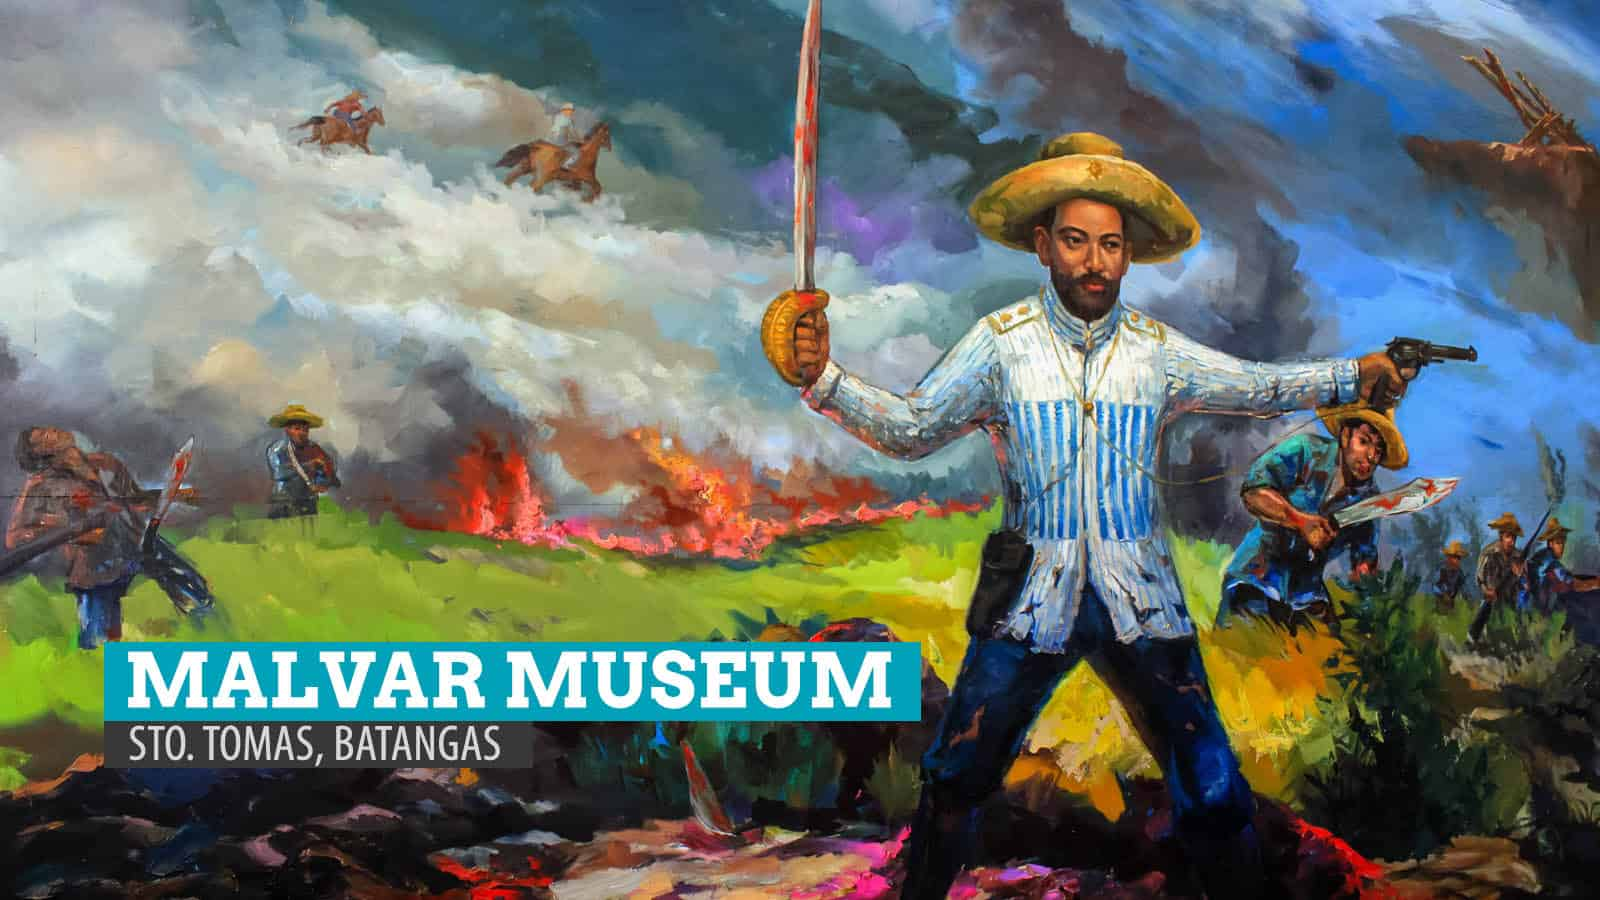 Miguel Malvar Museum, Batangas: Of Battles and Surrender